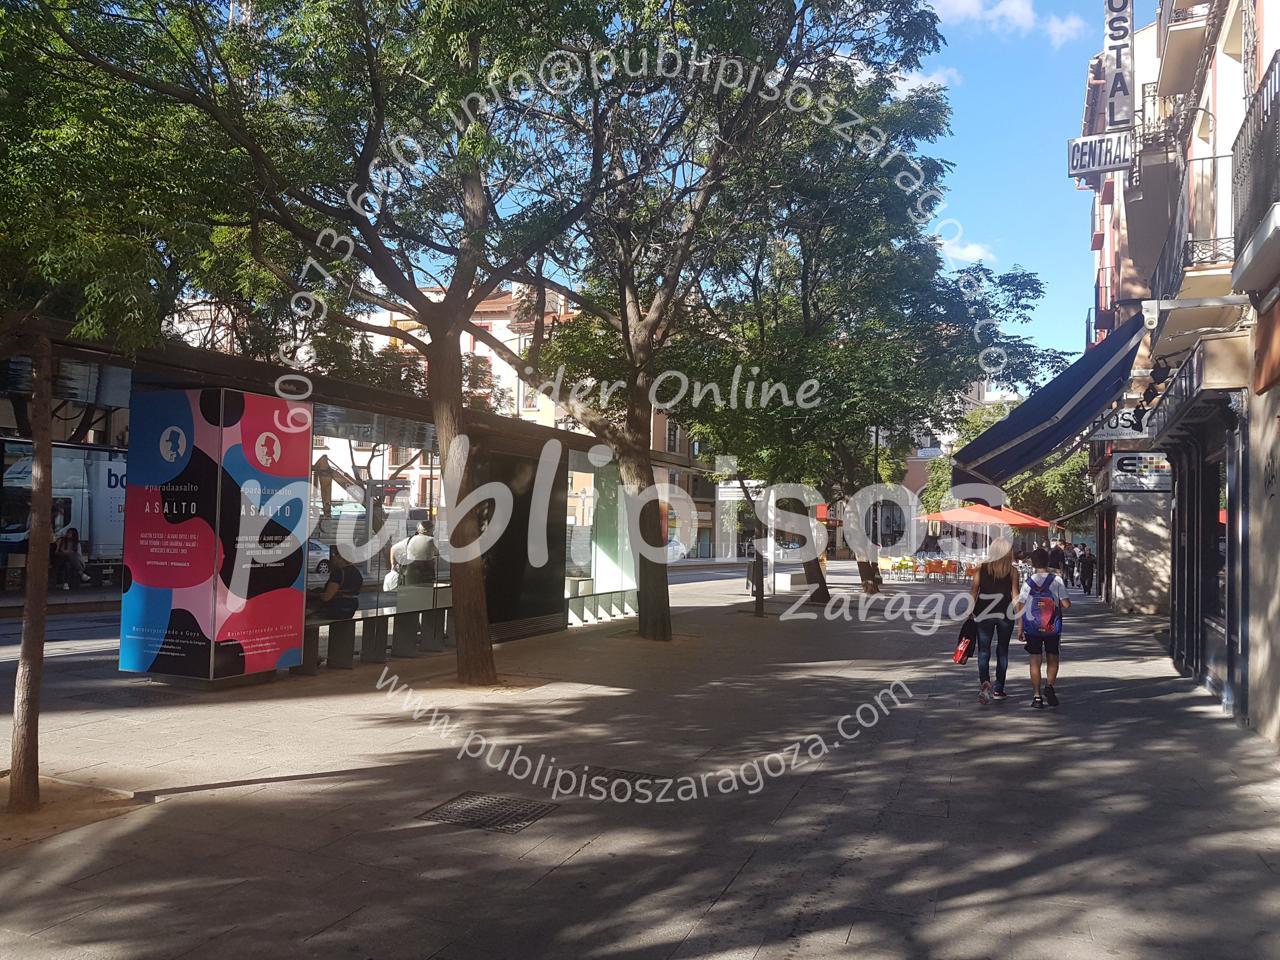 Venta Atico Duplex Obra Nueva Centro Casco Histórico Zaragoza|PUBLIPISOS Inmobiliarias-1